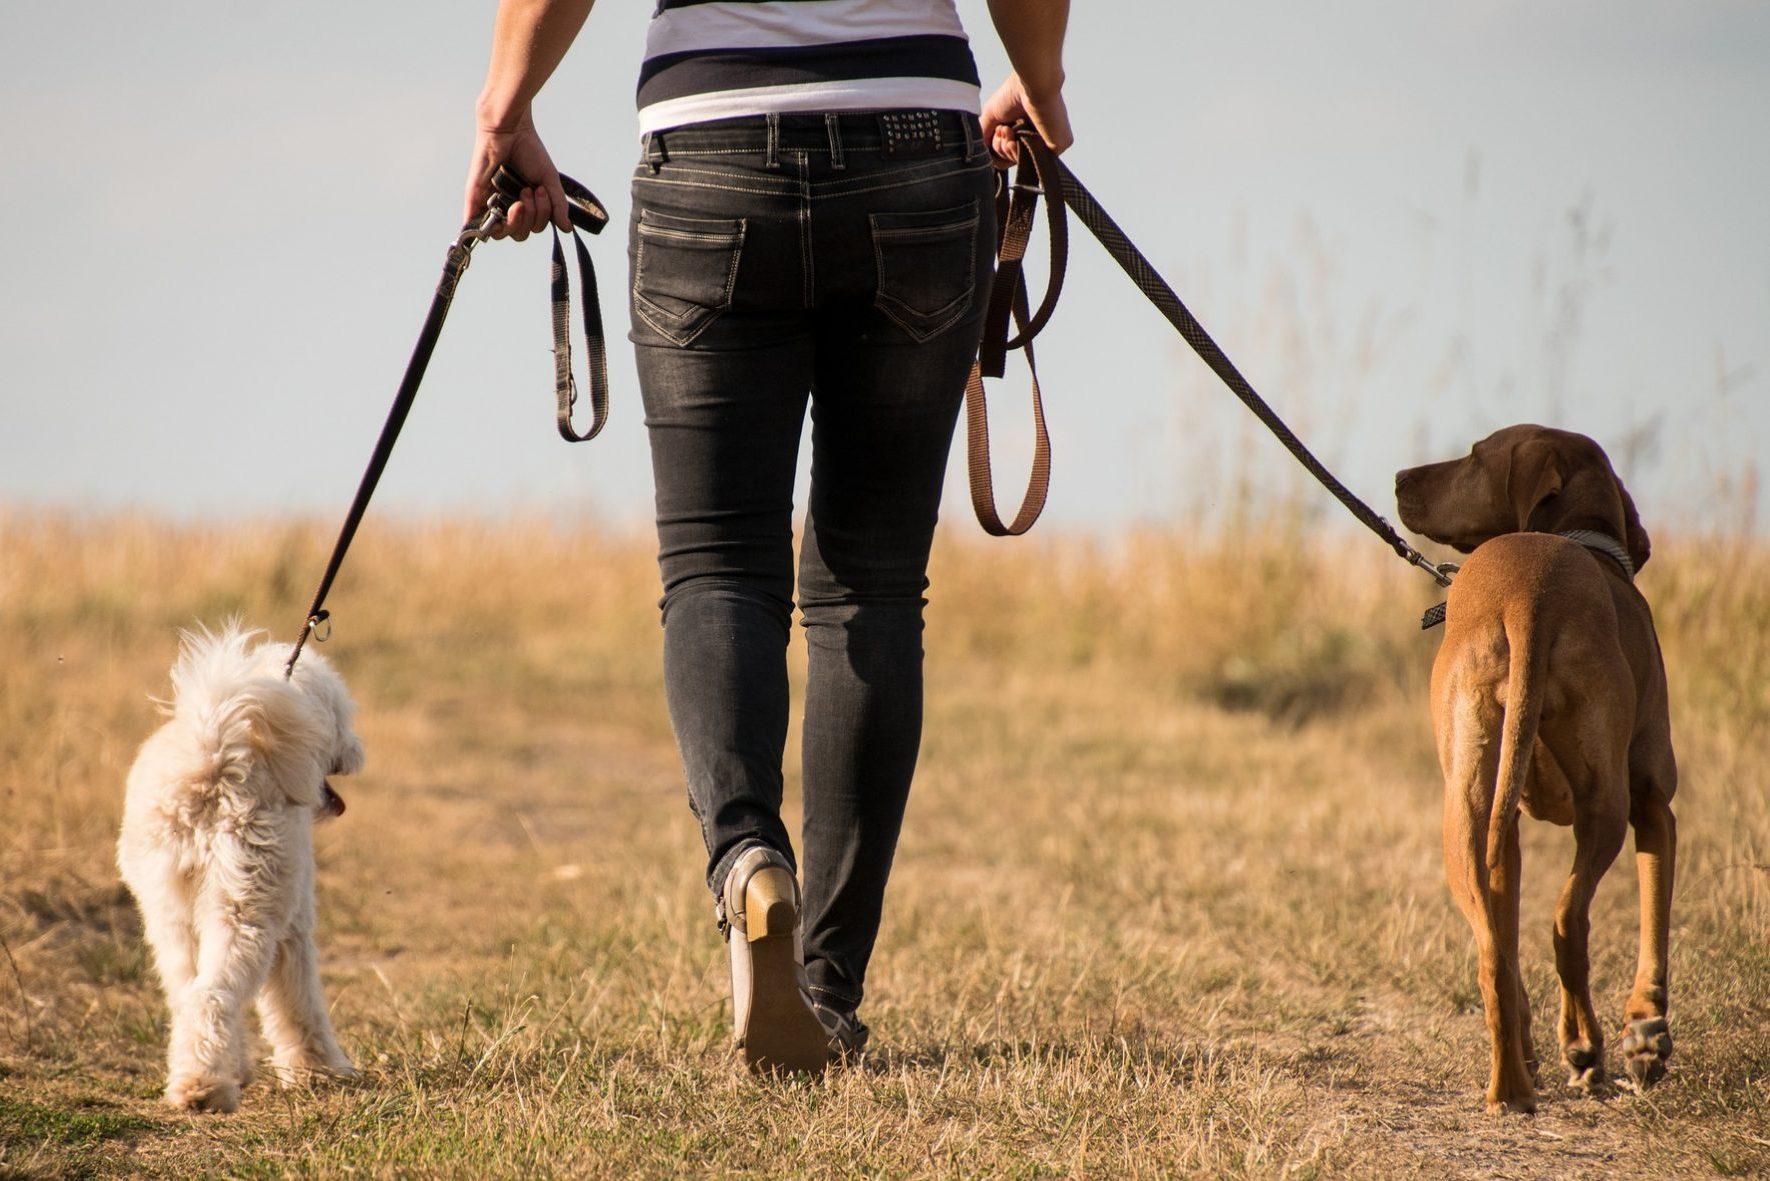 DOGS - Edmonton Humane Society